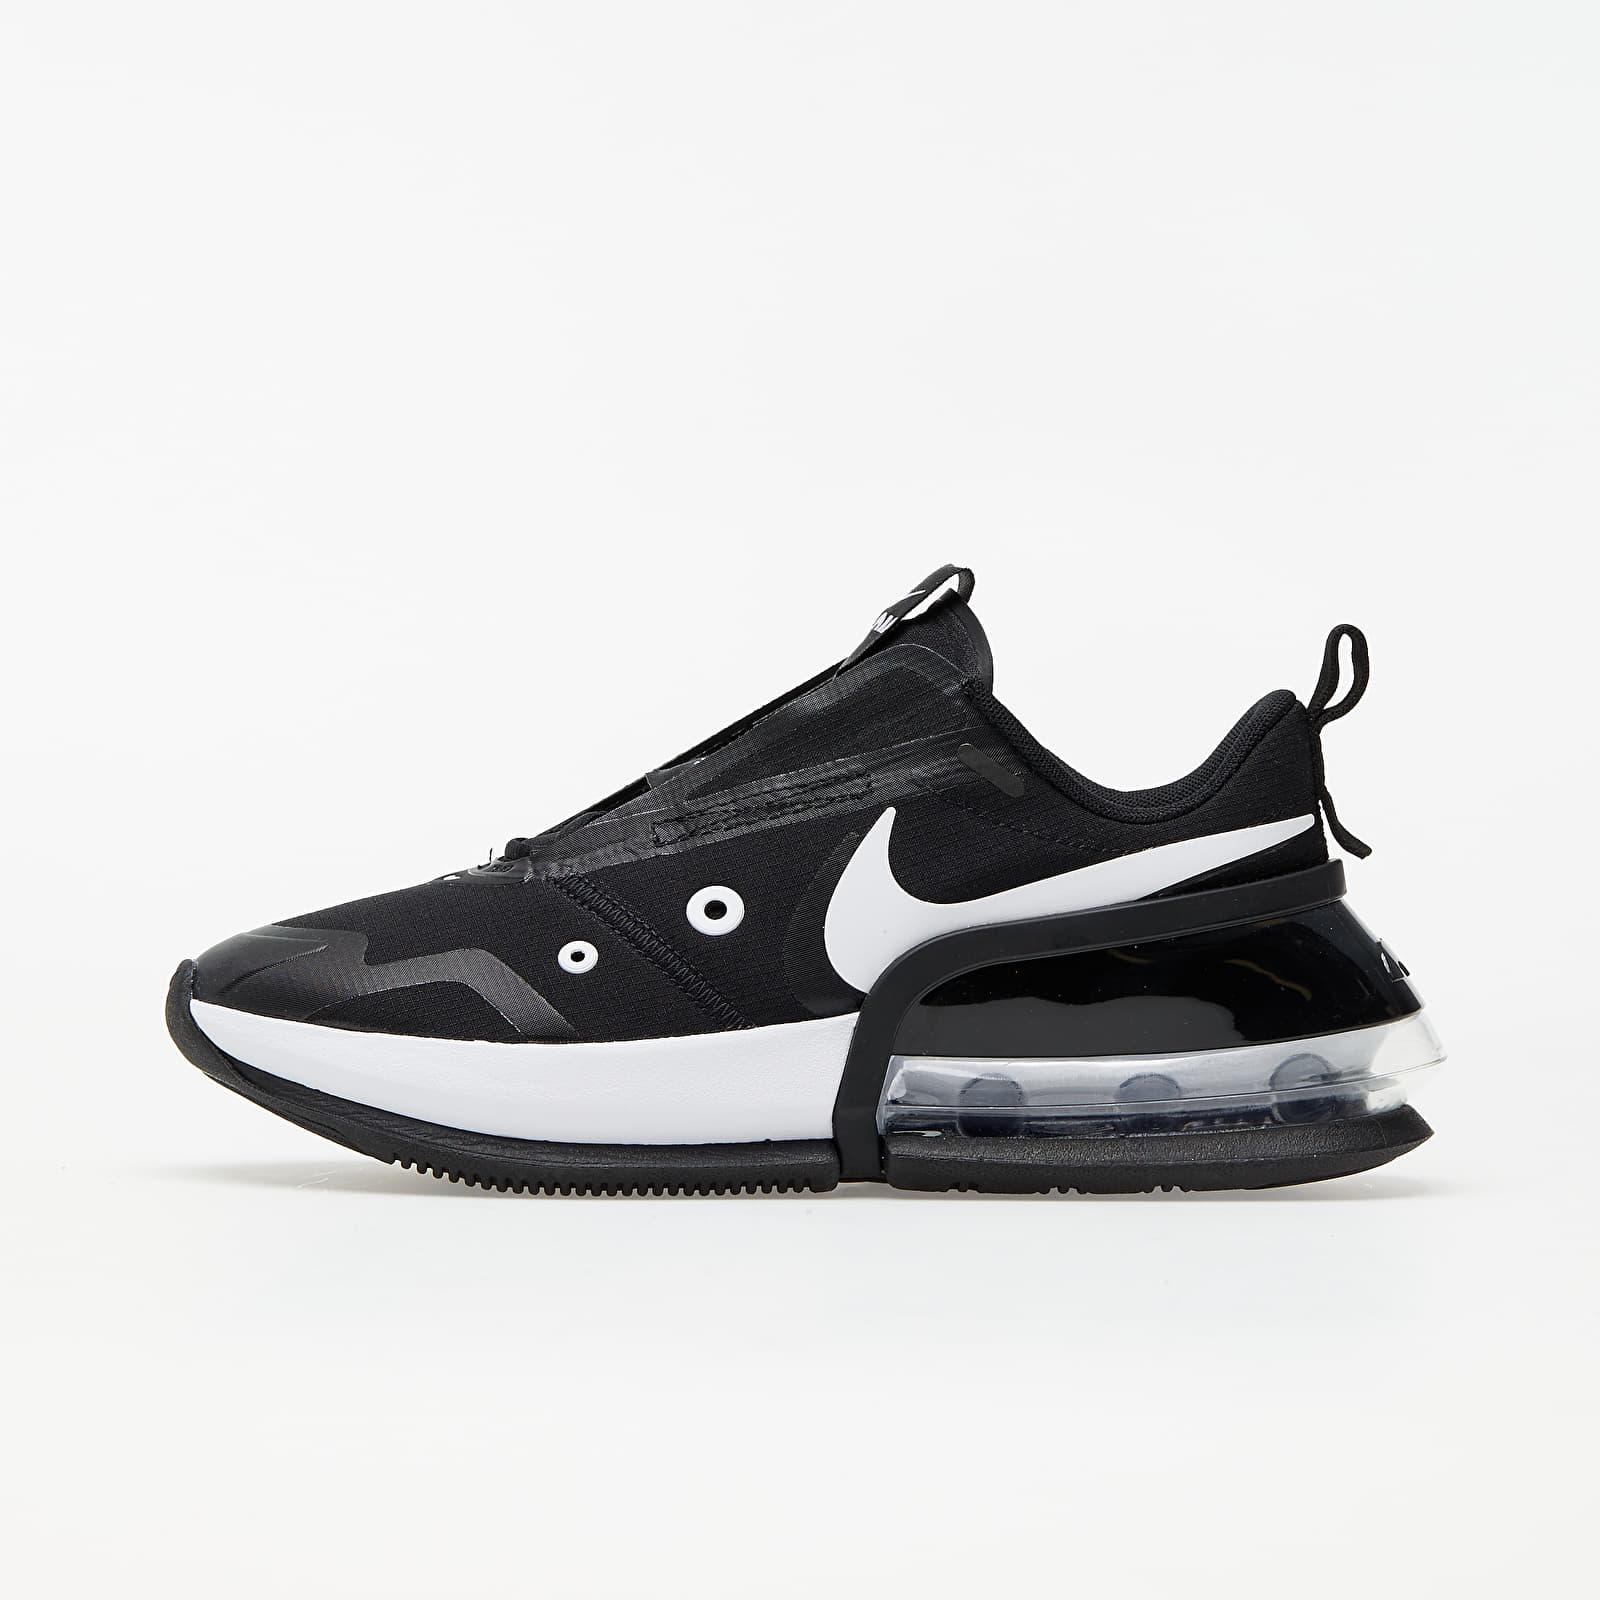 Nike W Air Max Up Black/ White-Metallic Silver CT1928-002